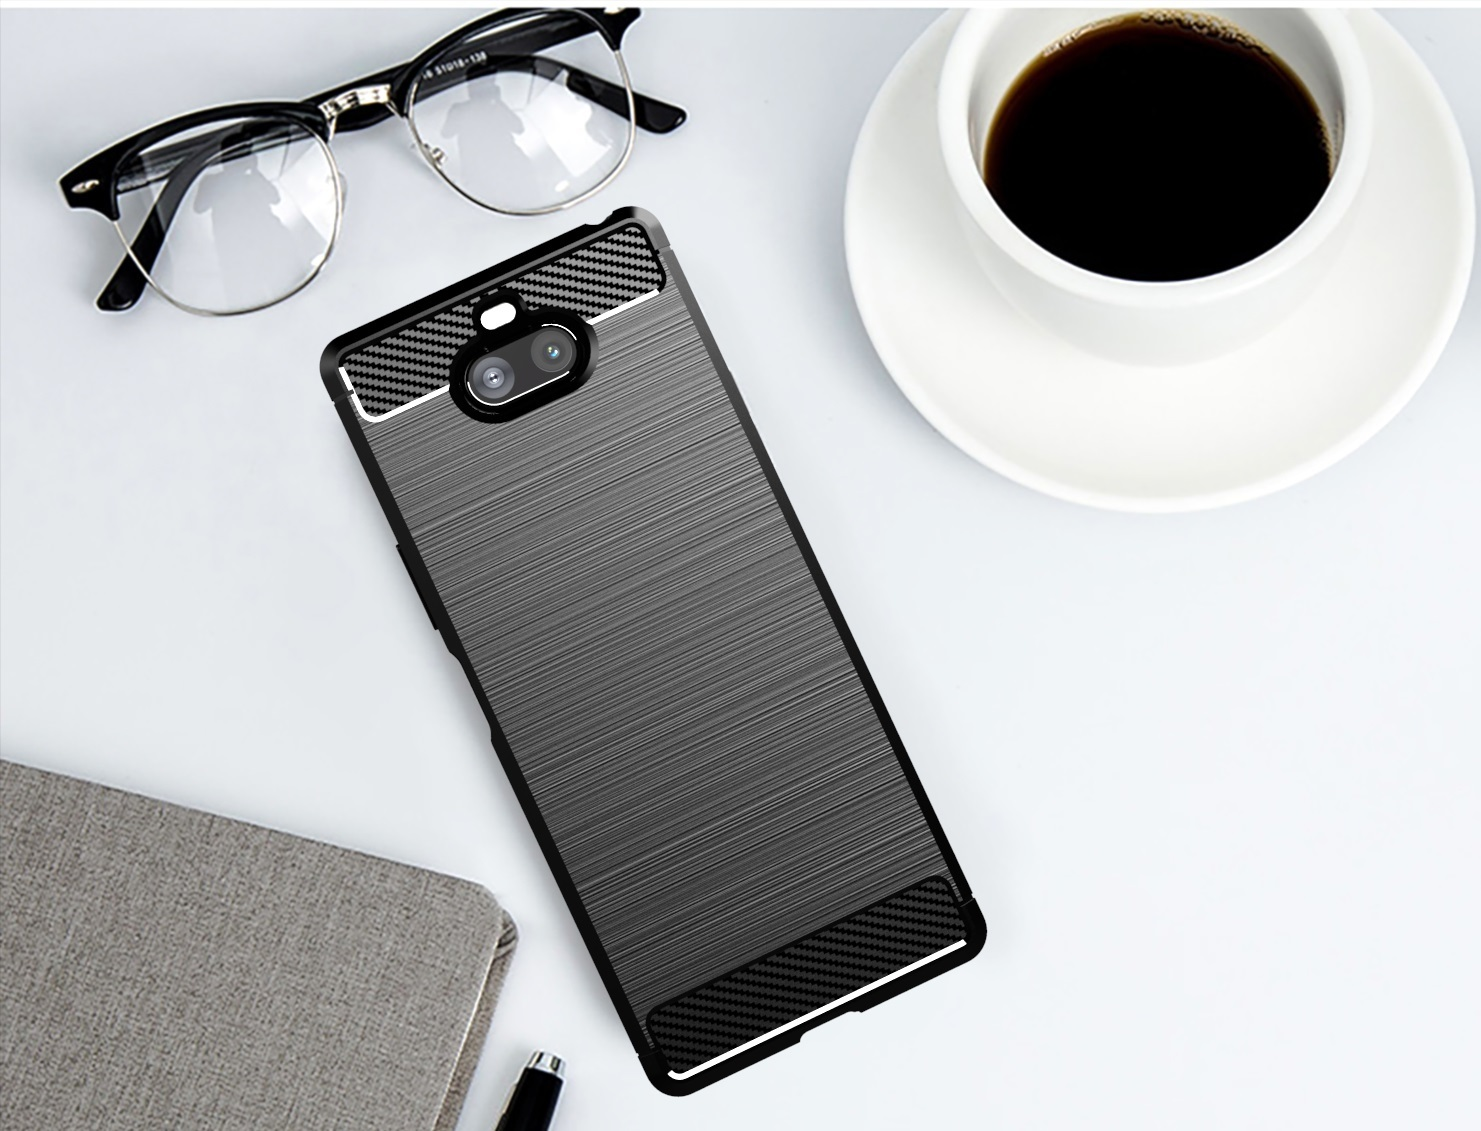 Чехол на Sony Xperia 8 цвет Black (черный), серия Carbon от Caseport